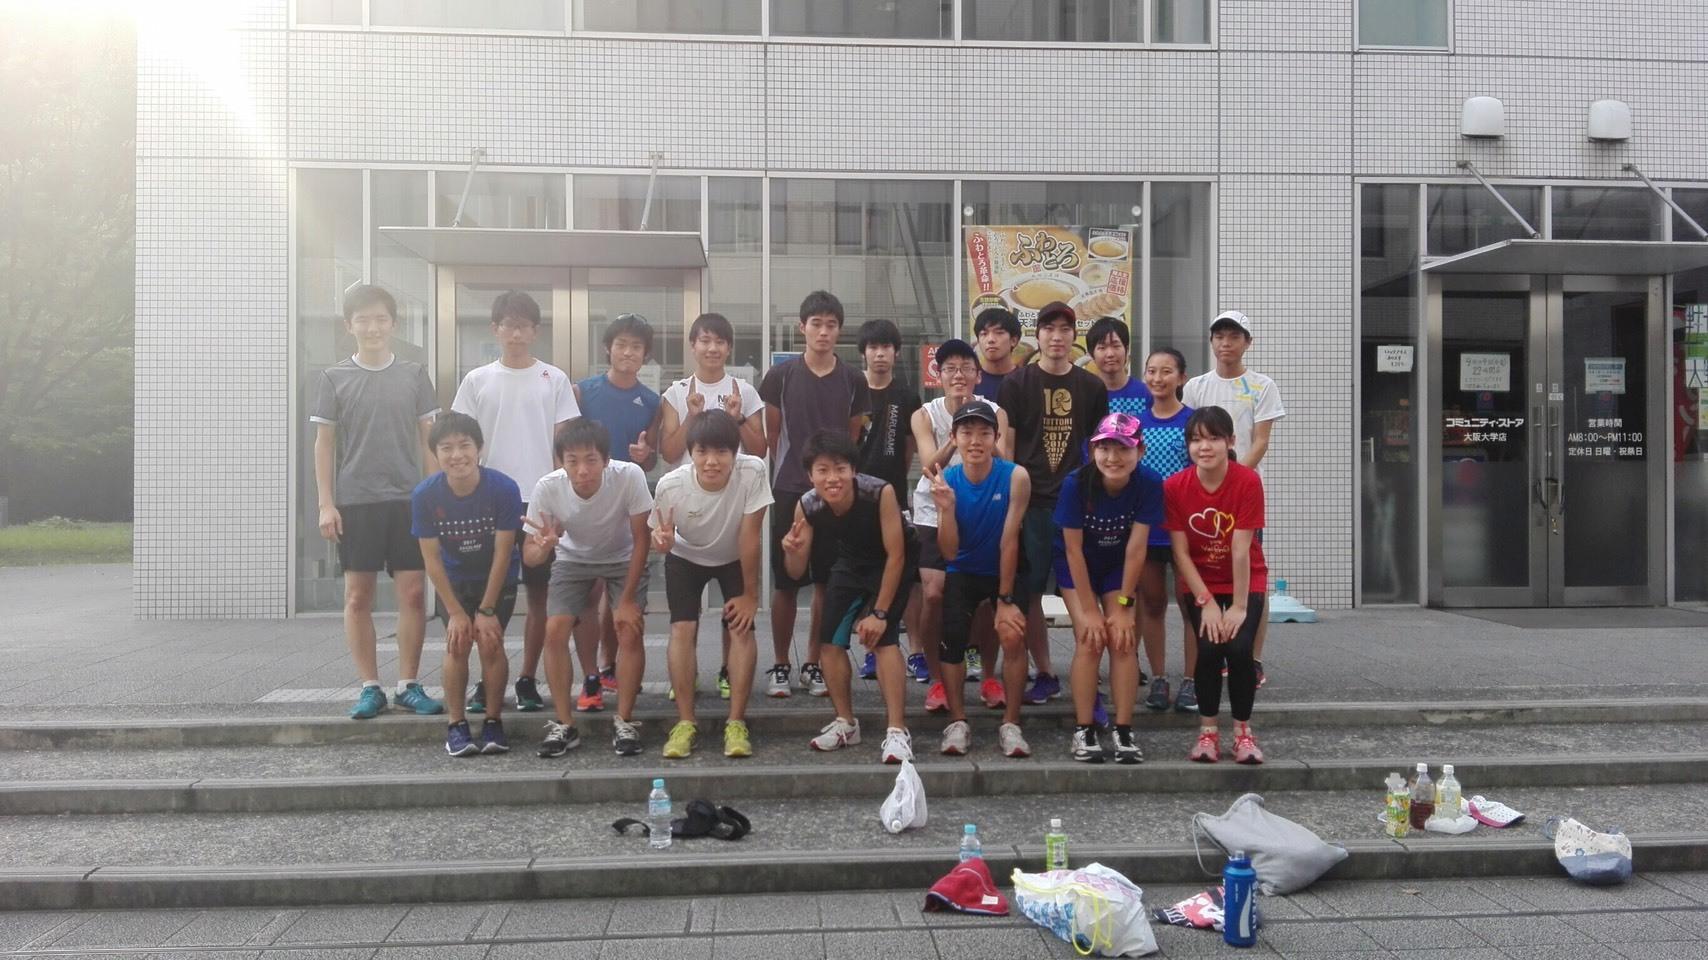 S__71868421.jpg